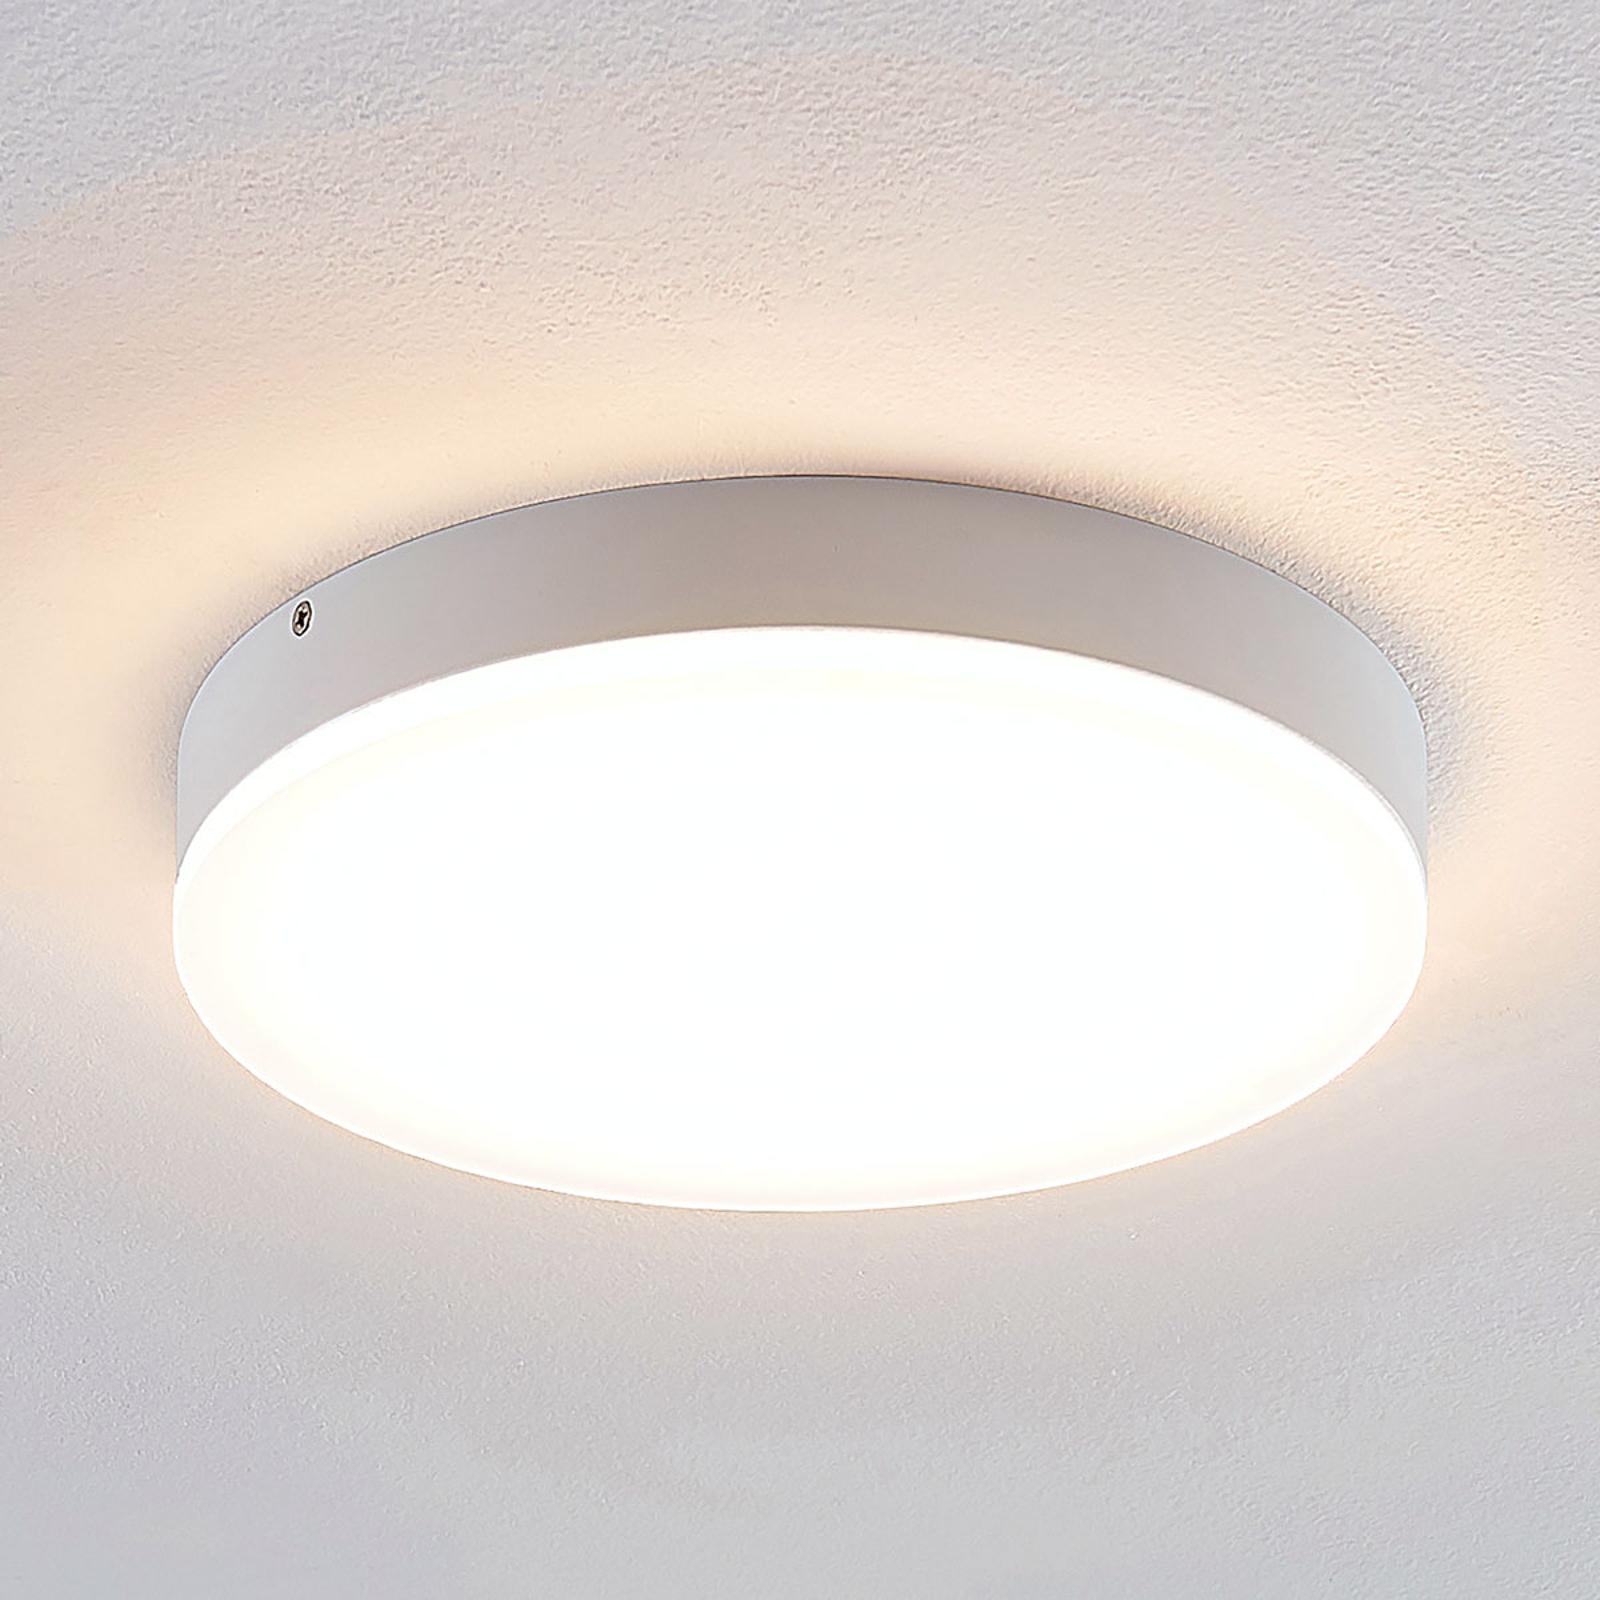 Lindby Leonta LED-kattovalaisin, valkoinen, 25 cm